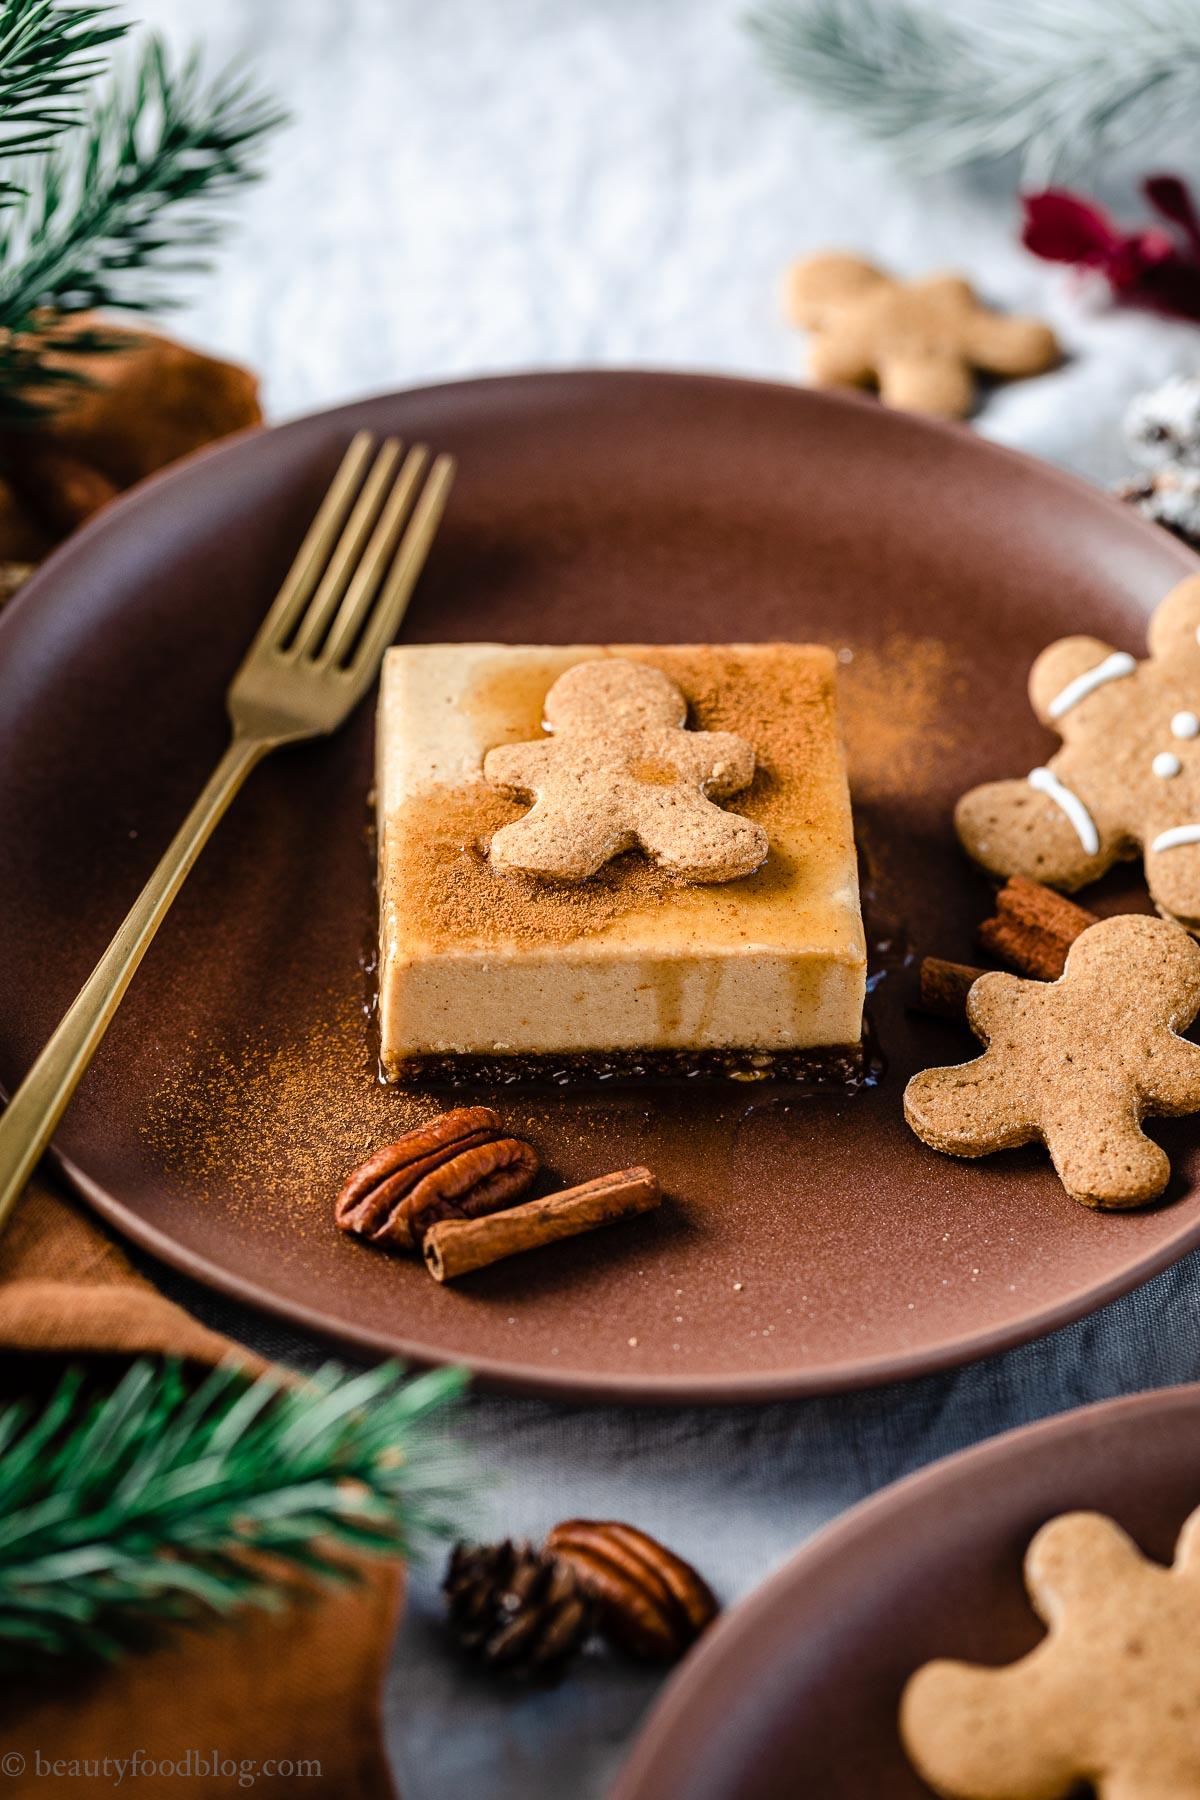 ricetta cremosa cheesecake al pan di zenzero senza cottura creamy vegan no-bake gingerbread cheesecake gluten-free